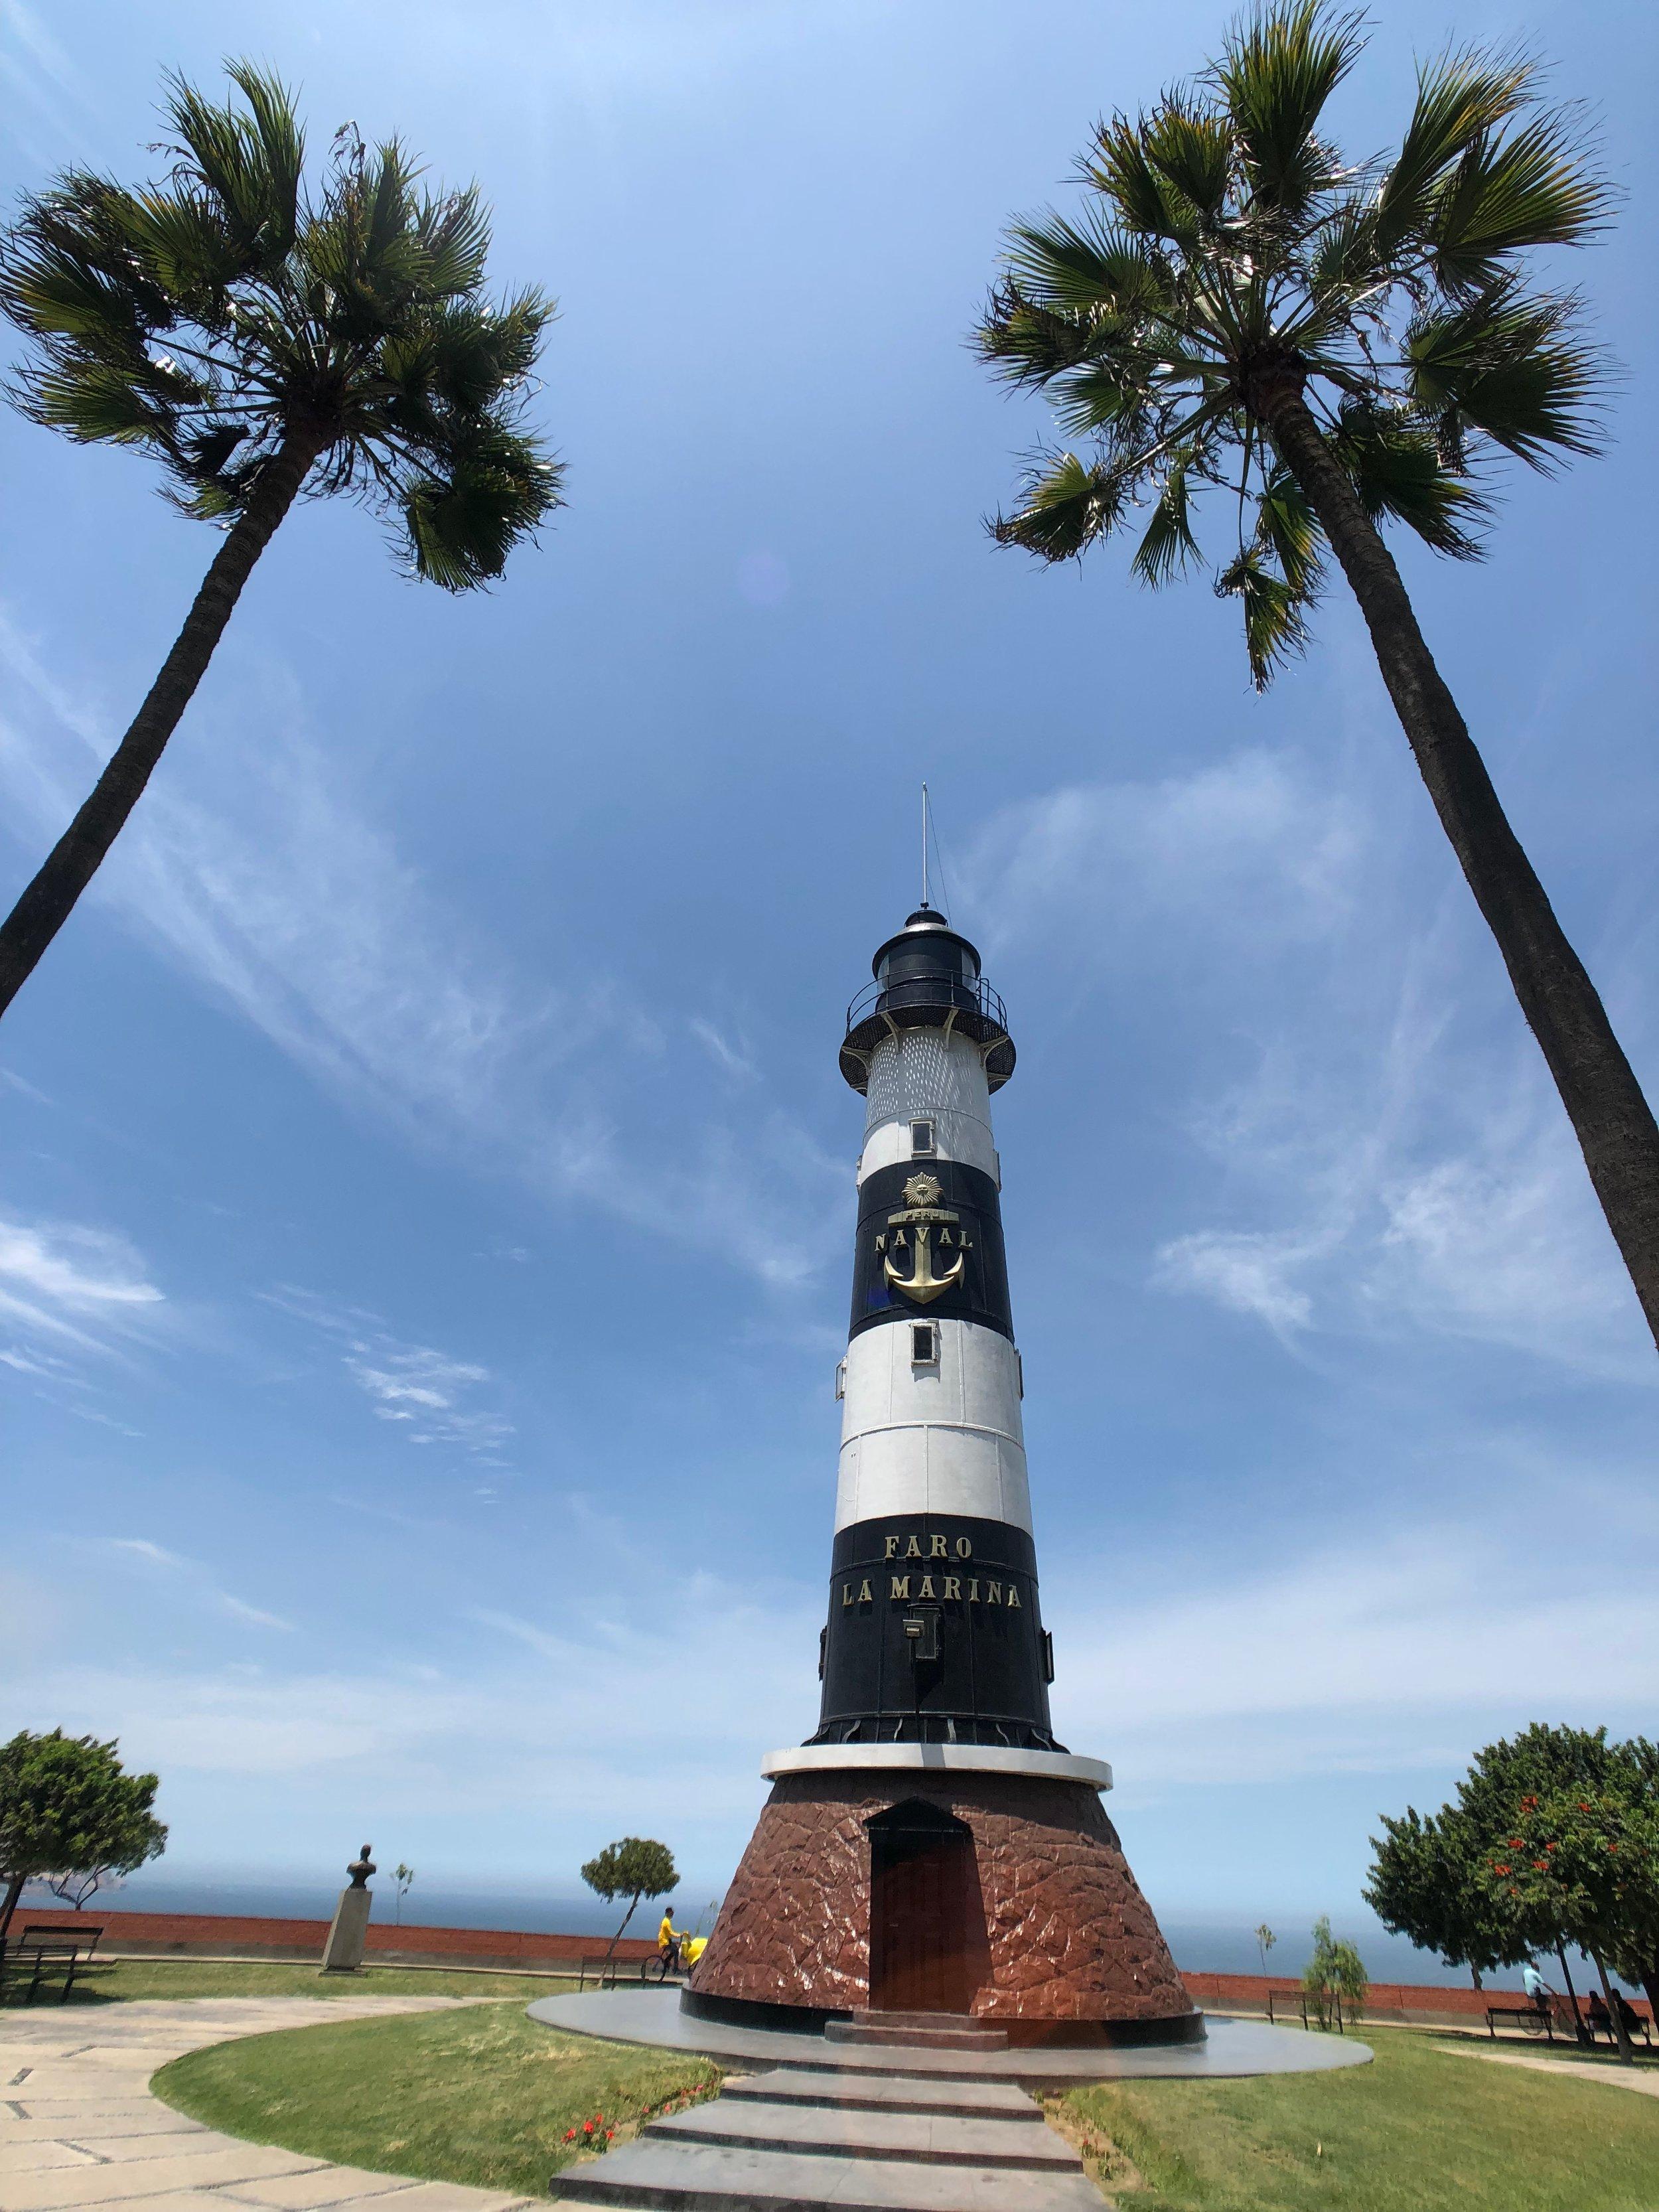 Miraflores-malecon boardwalk - lima - peru - parque del amor - travel tips - south america - lighthouse